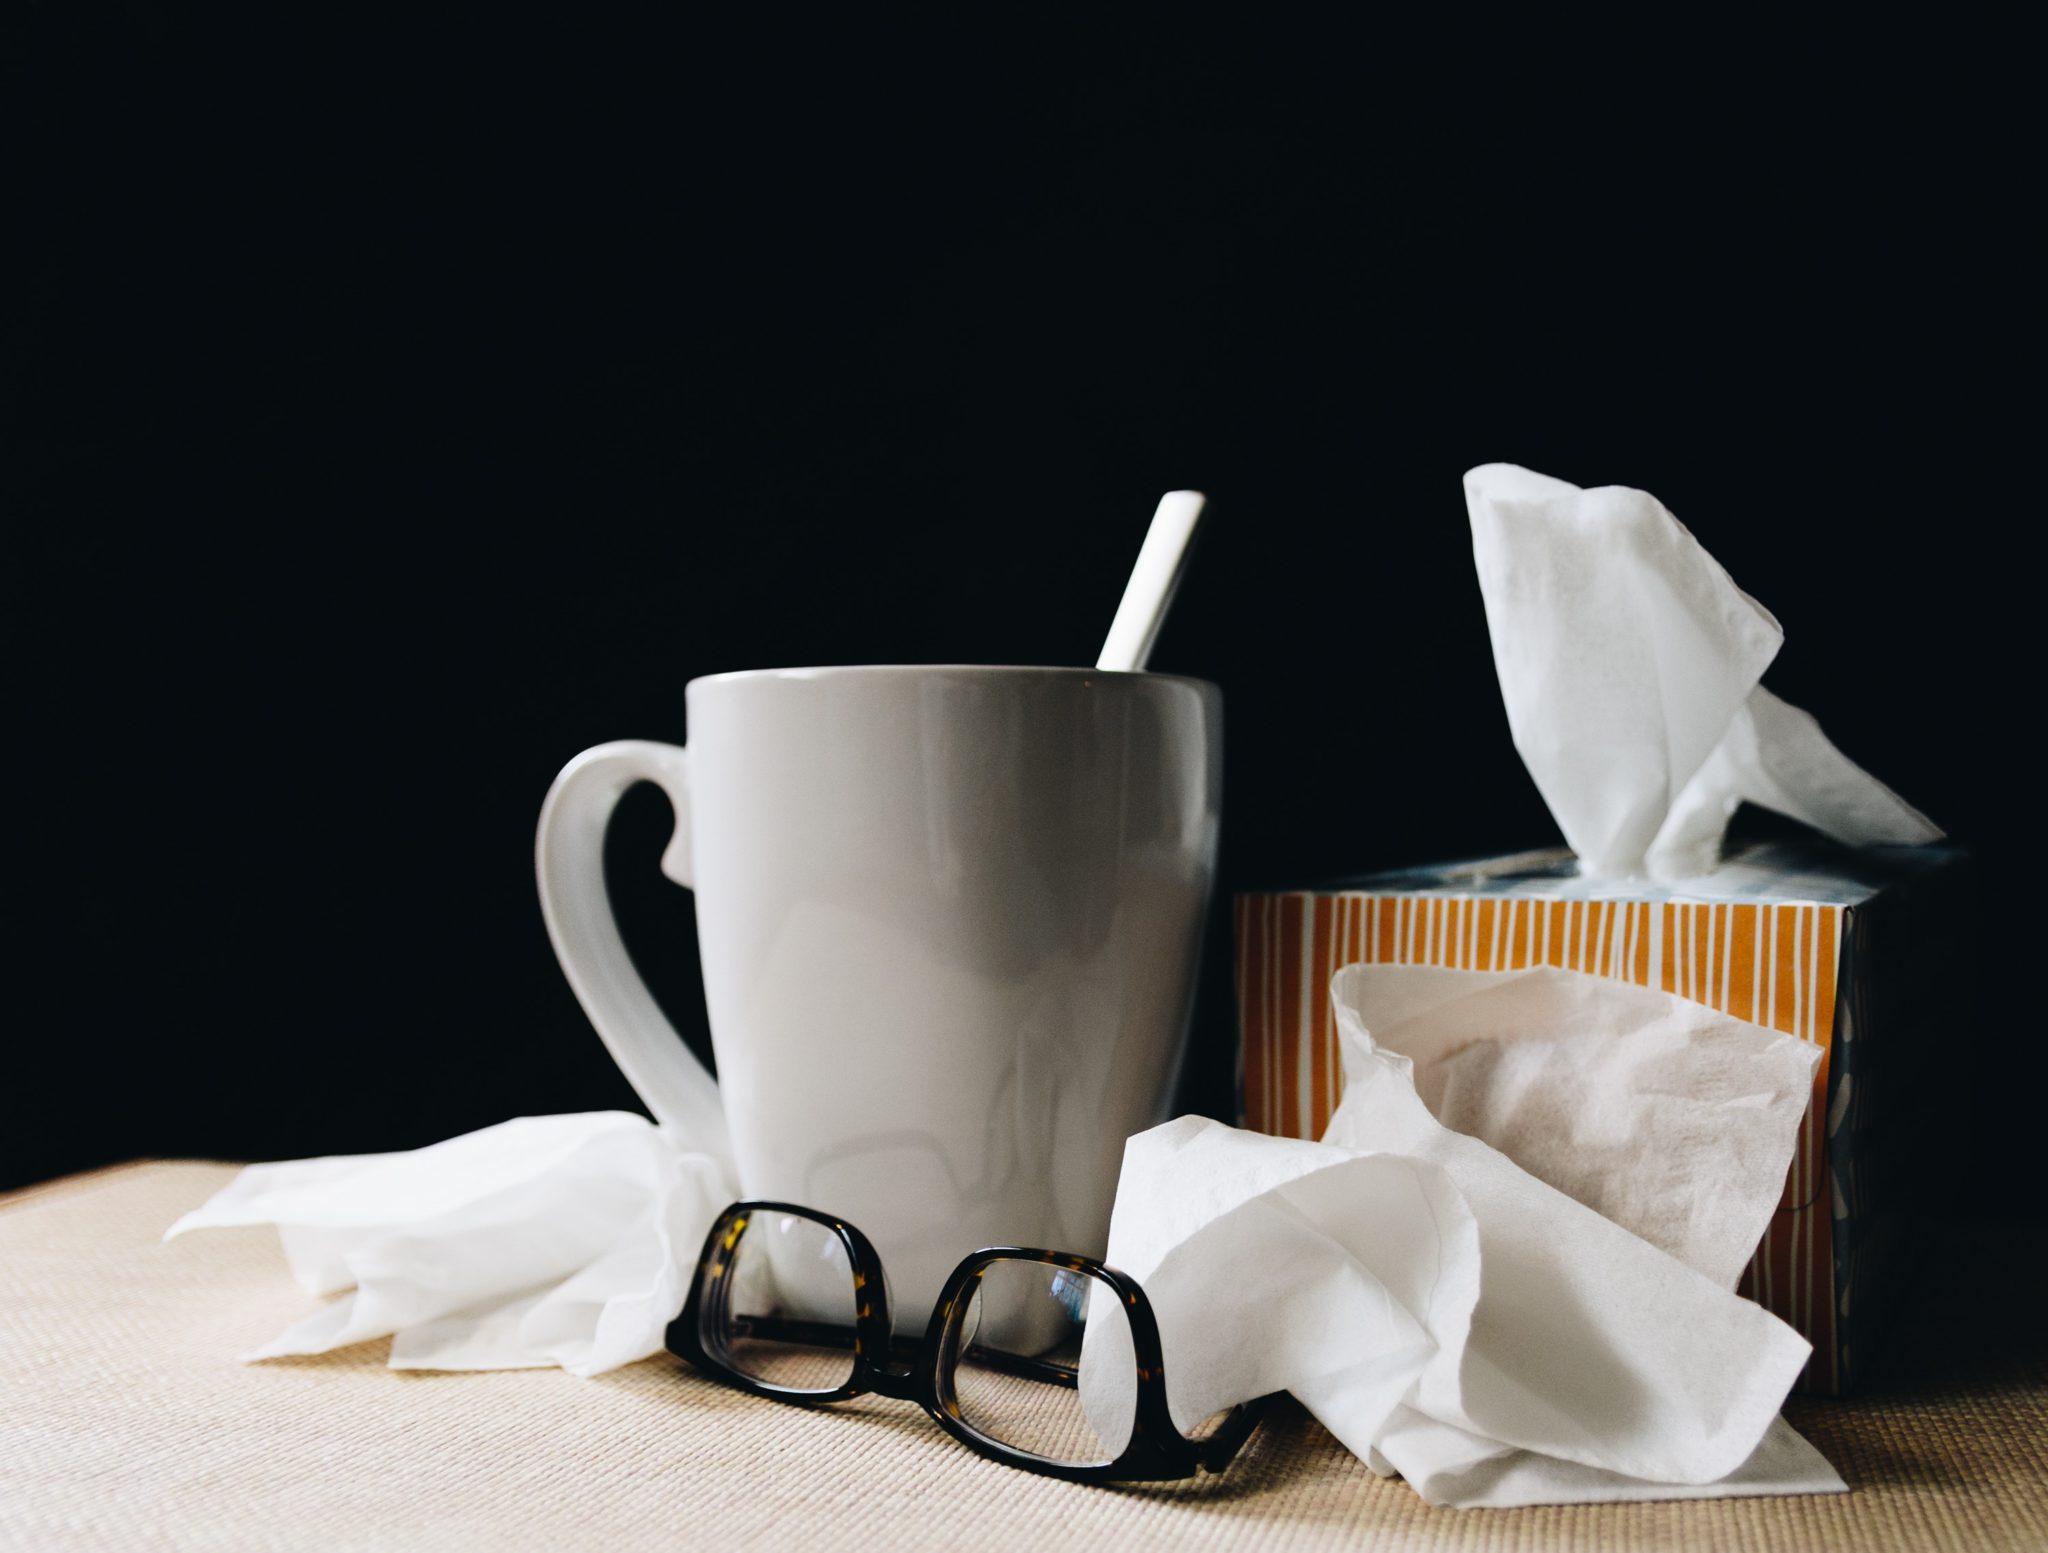 Why did I get the flu if I got my flu shot?